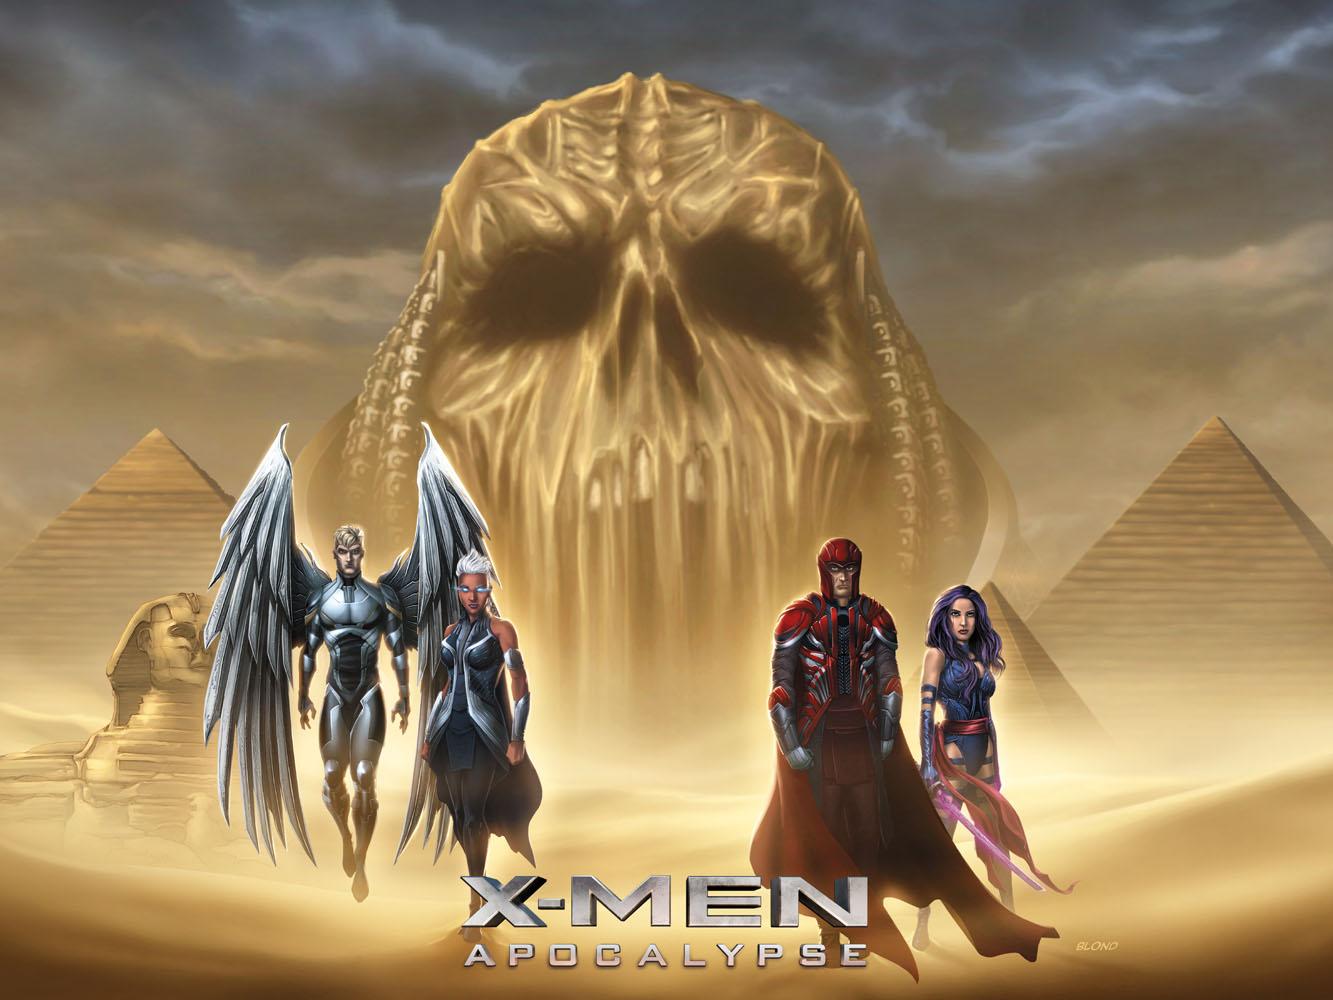 X-Men: Apocalypse by BlondTheColorist